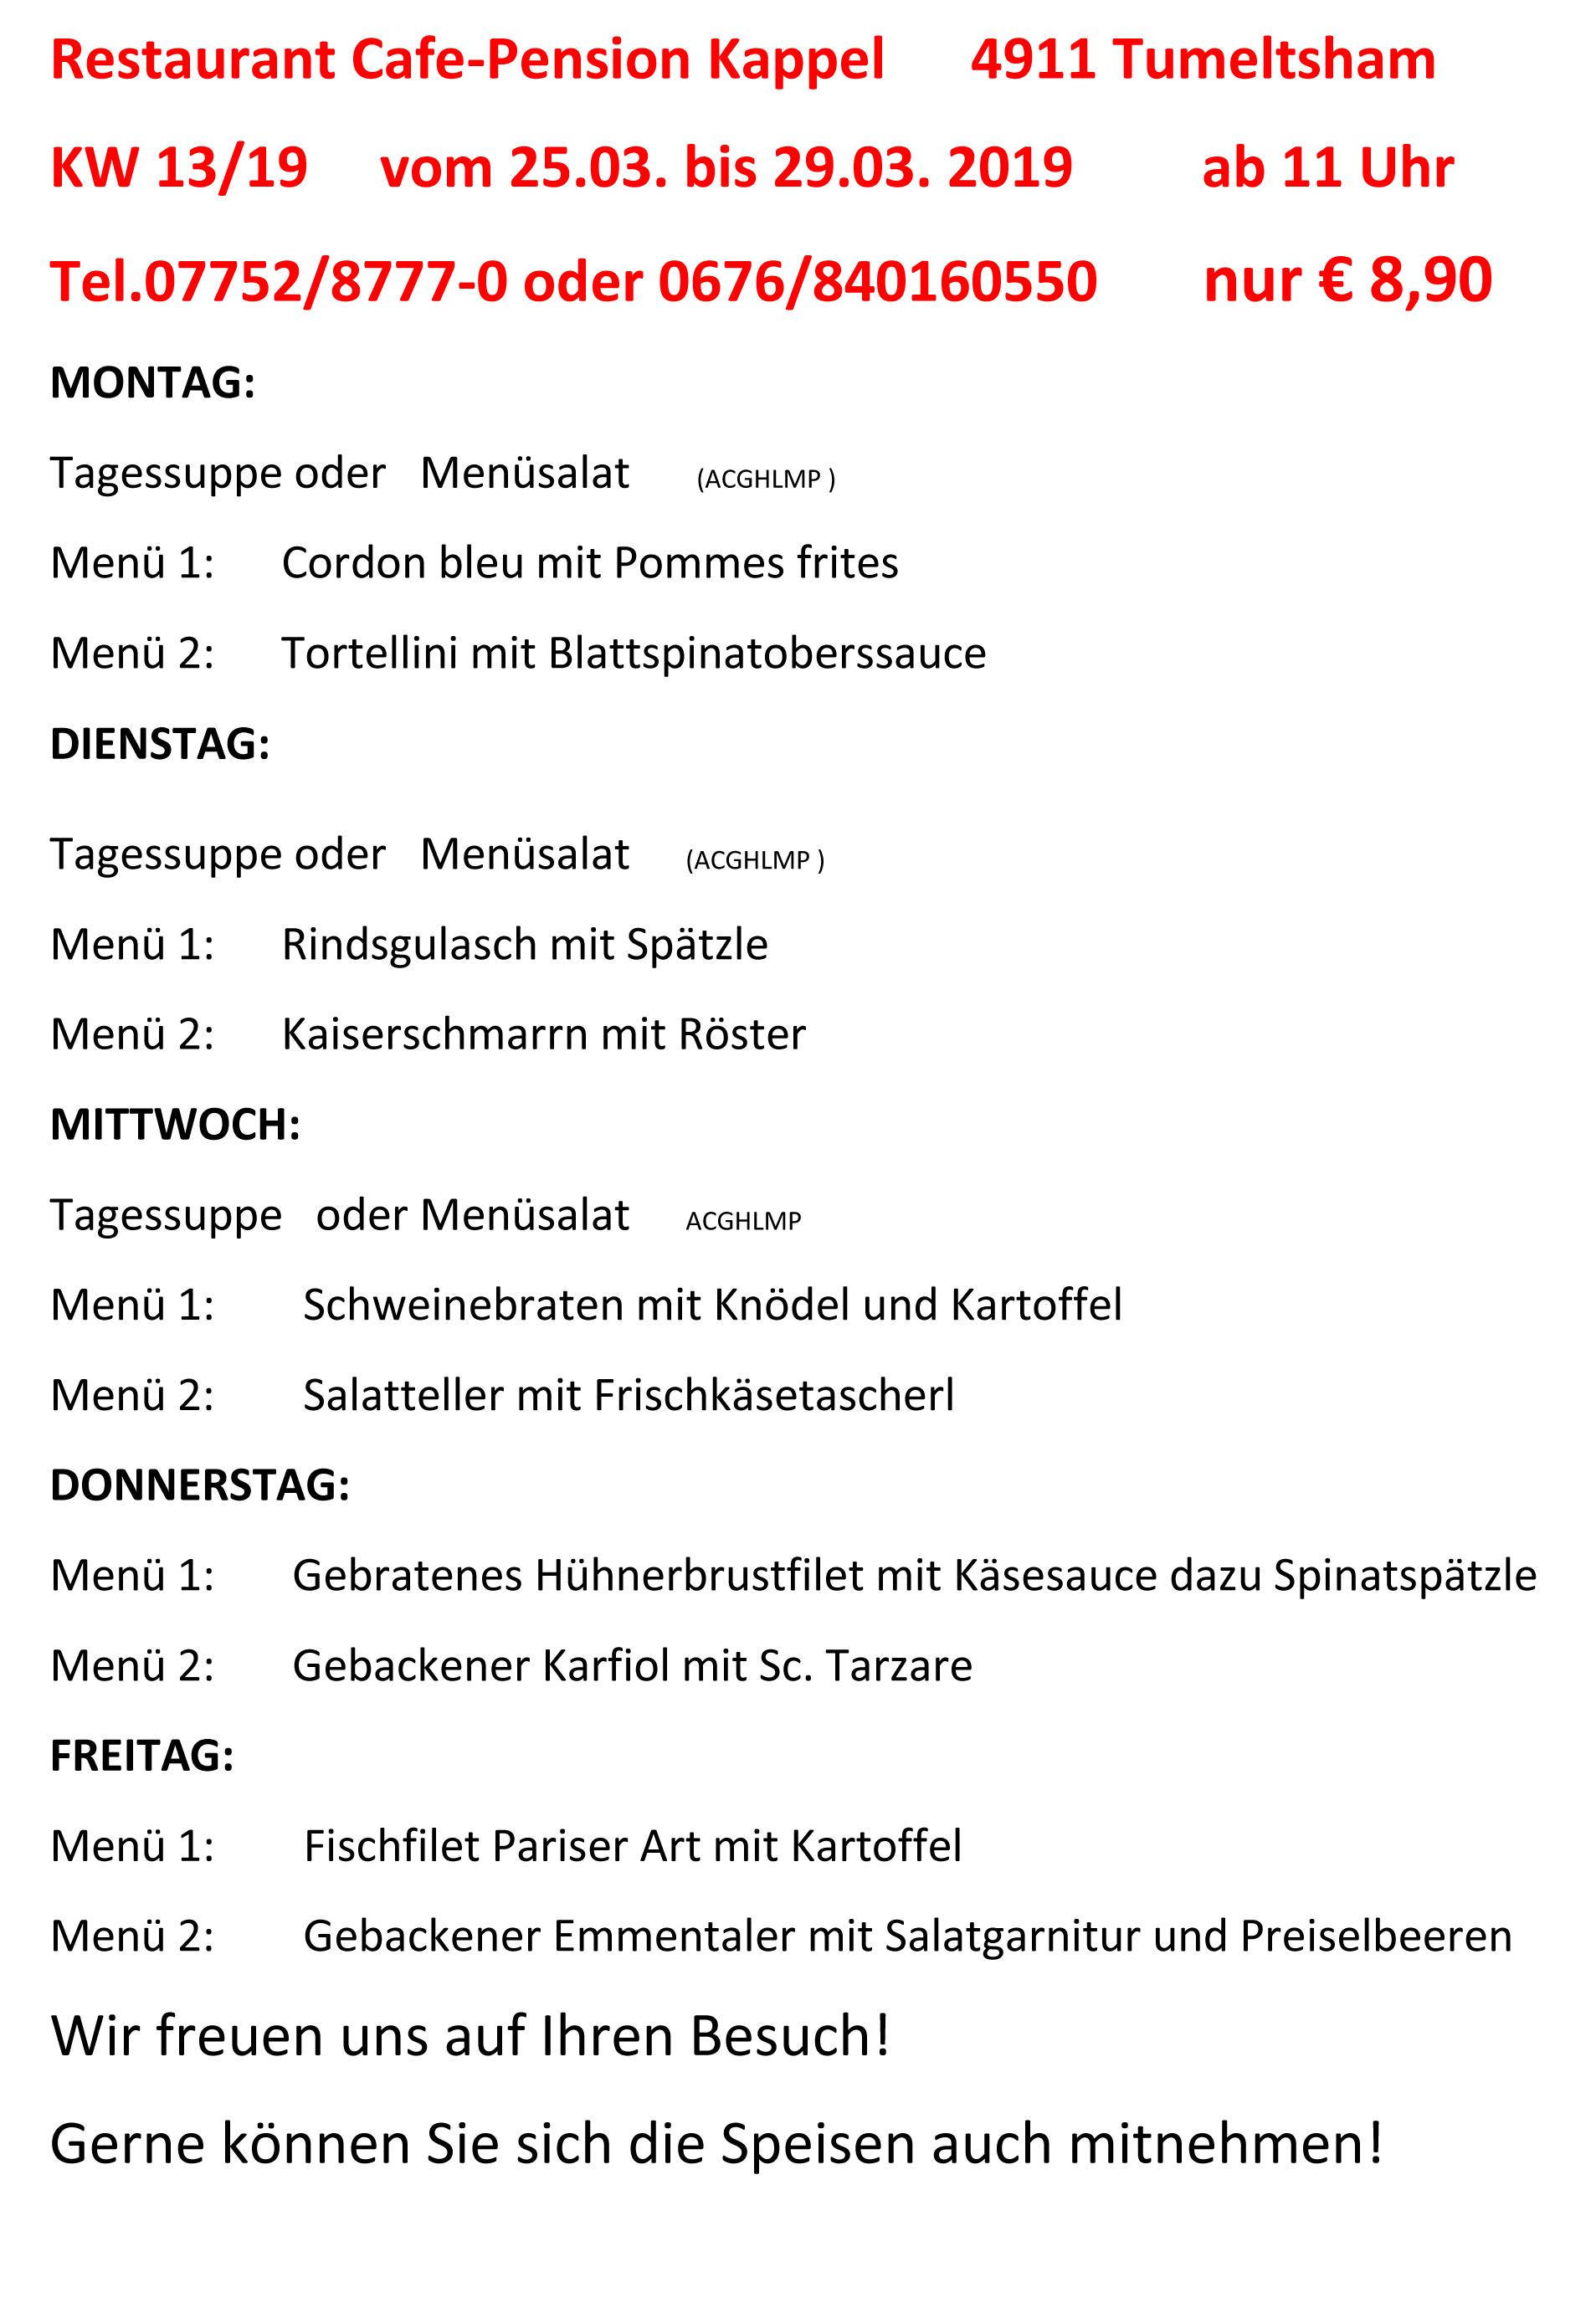 Menüplan KW 13-19docx (1)